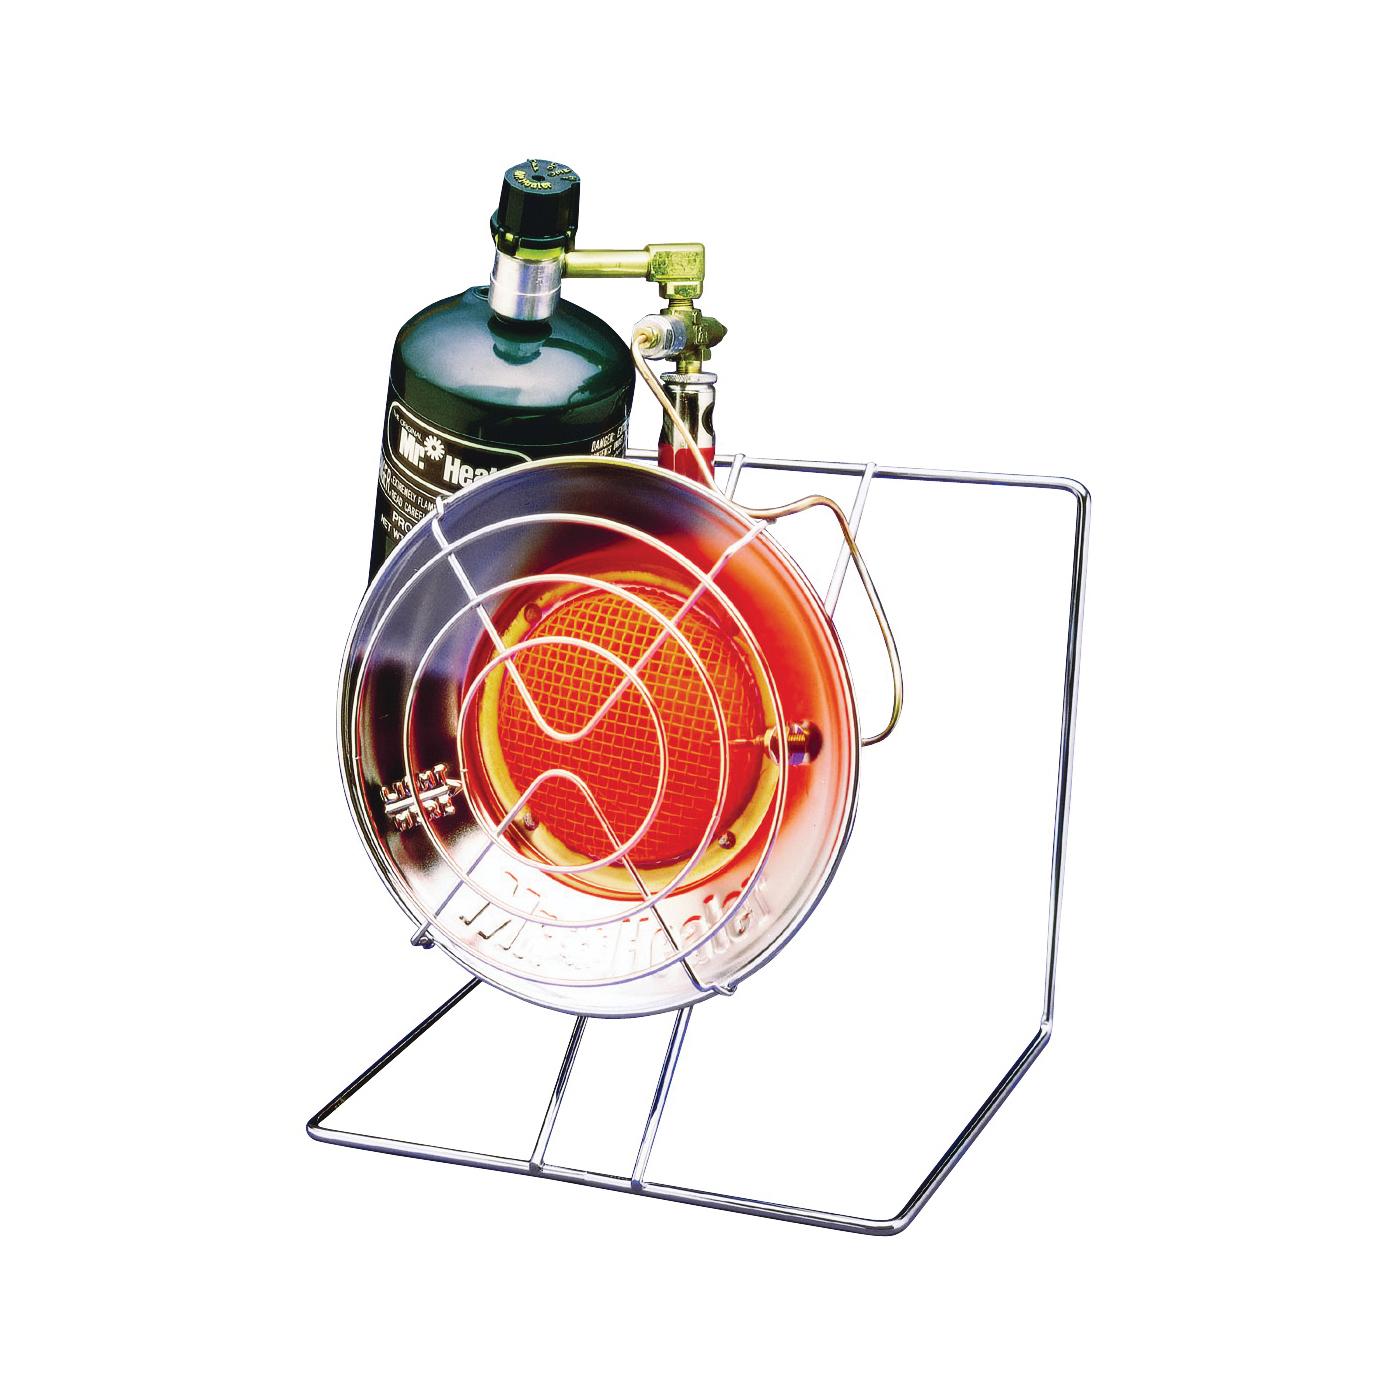 Picture of Mr. Heater F242300 Single Tank Top Heater Cooker, 1 lb Fuel Tank, Propane, 15000 Btu